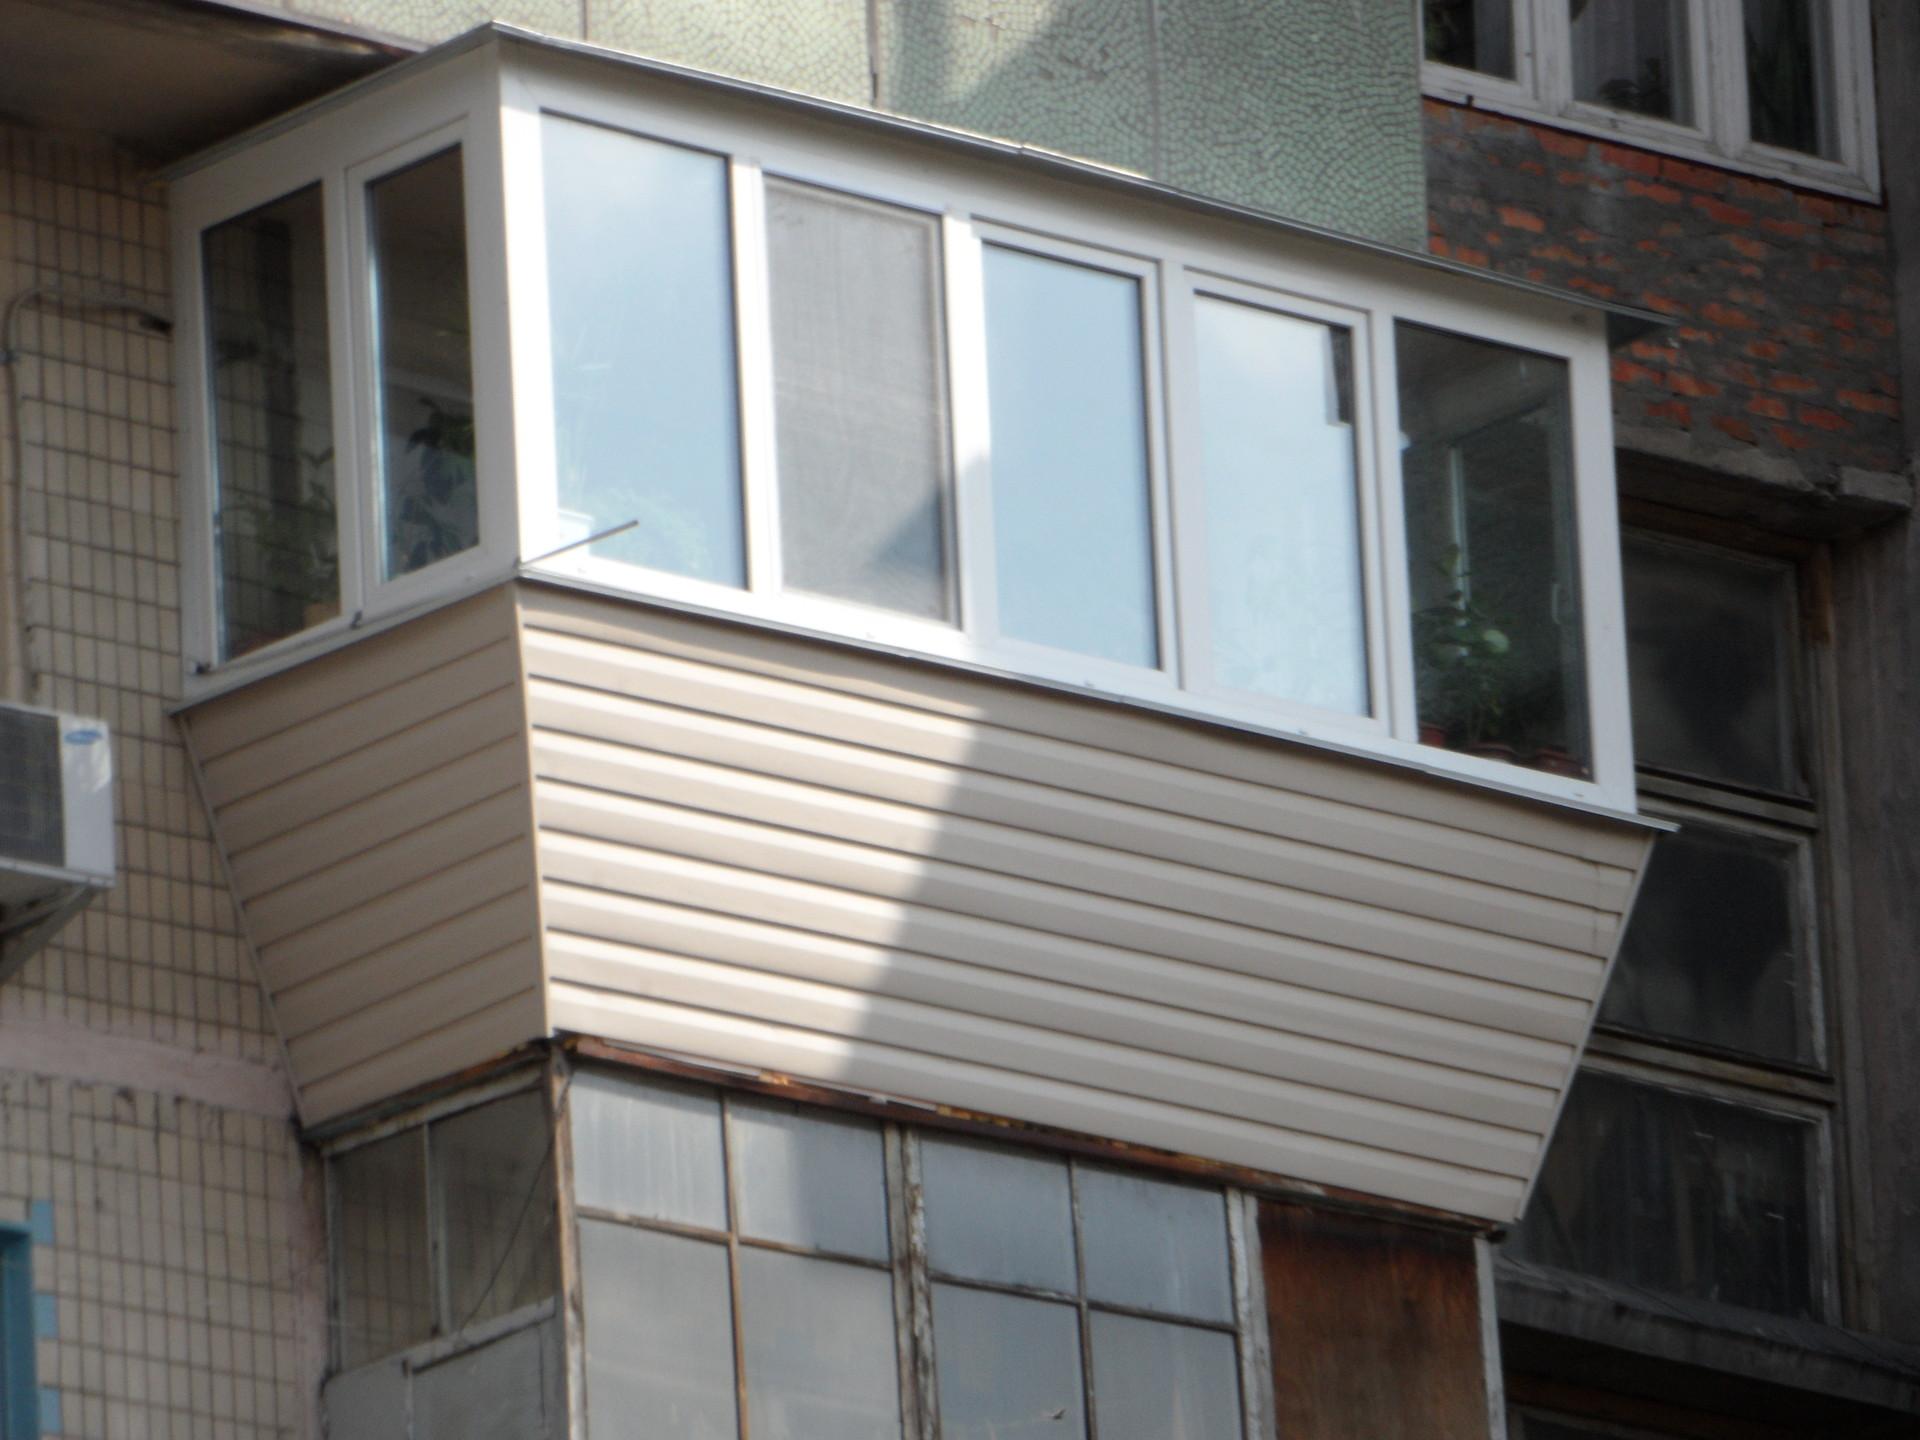 Балкон под ключ видное. - дизайн маленьких лоджий - каталог .